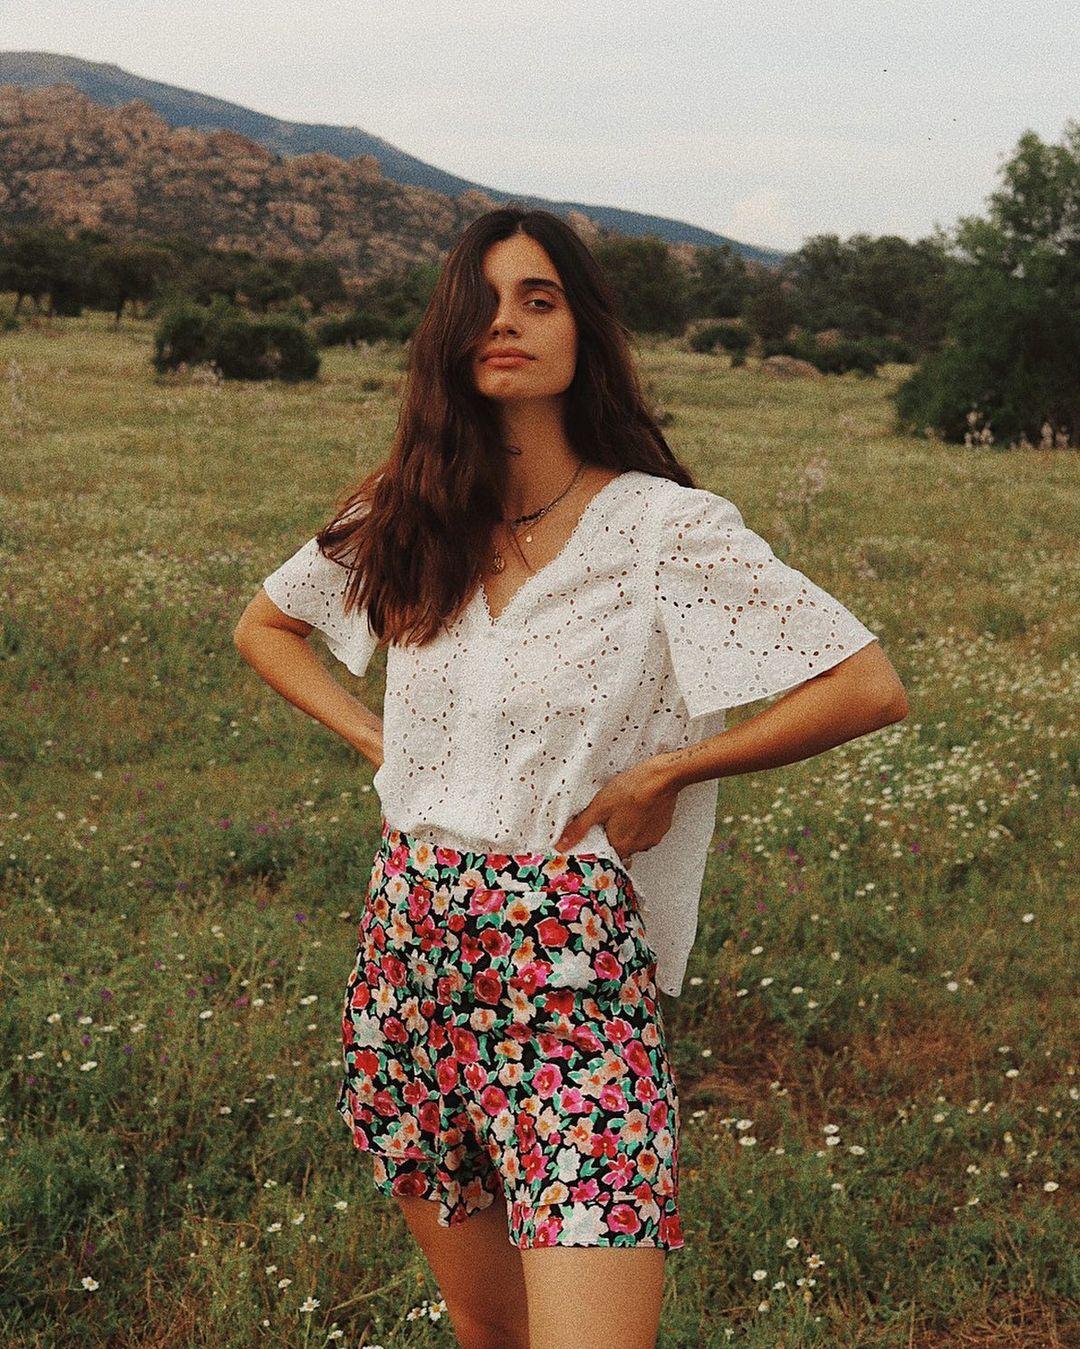 Itziar-Aguilera-Wallpapers-Insta-Fit-Bio-13